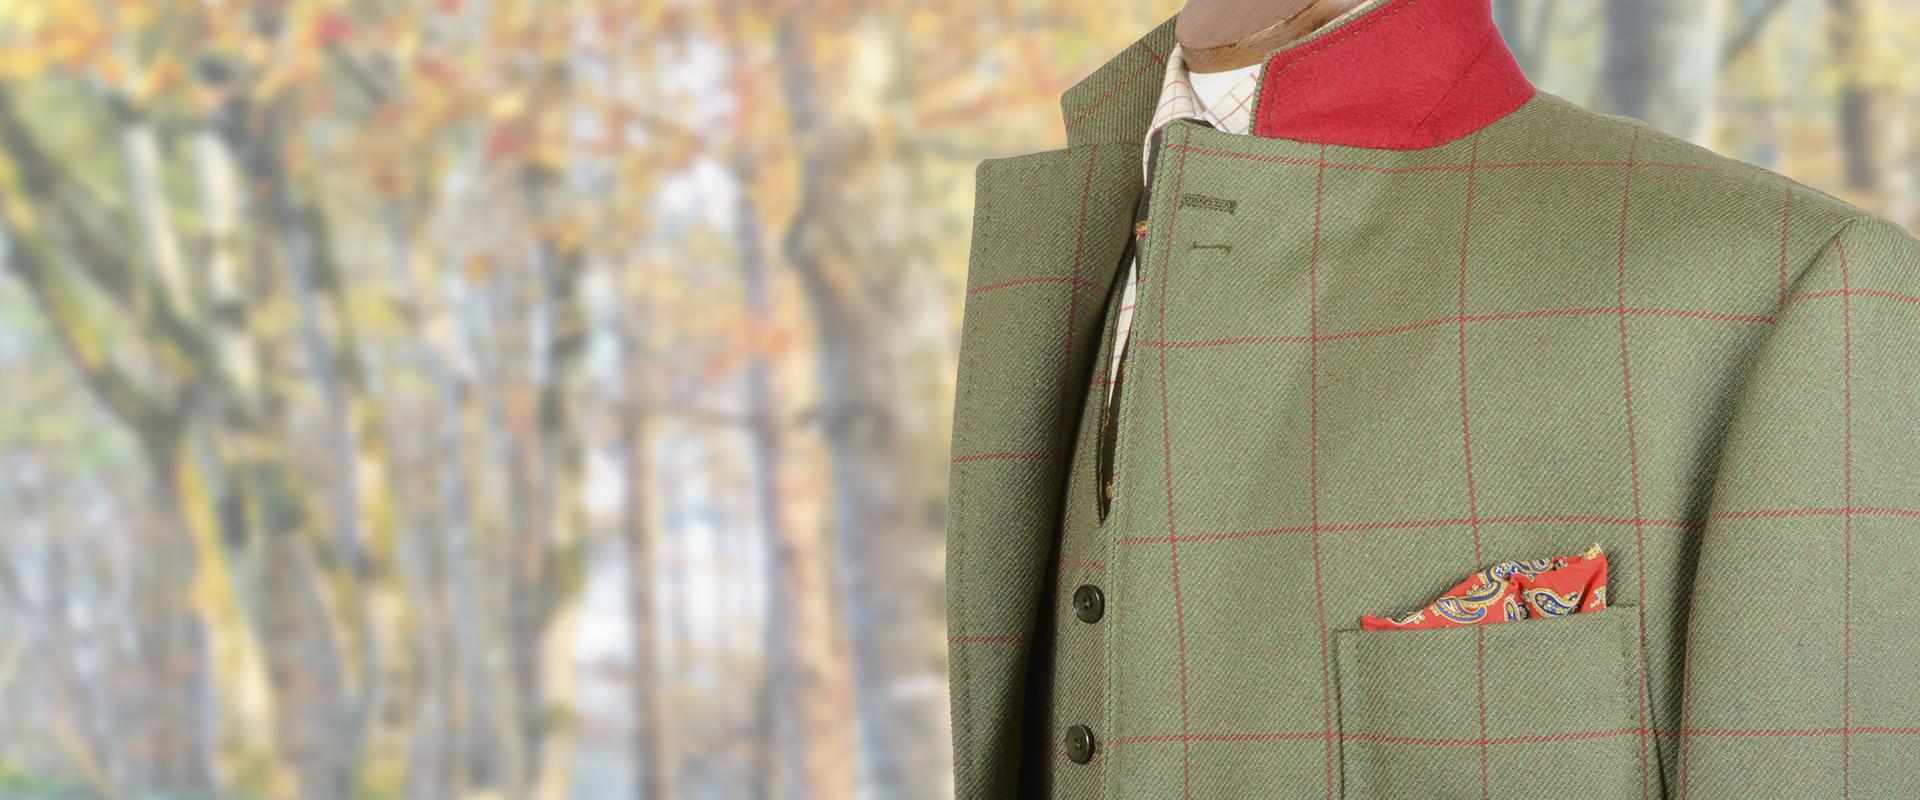 Rory Tweed Jacket and Waistcoat